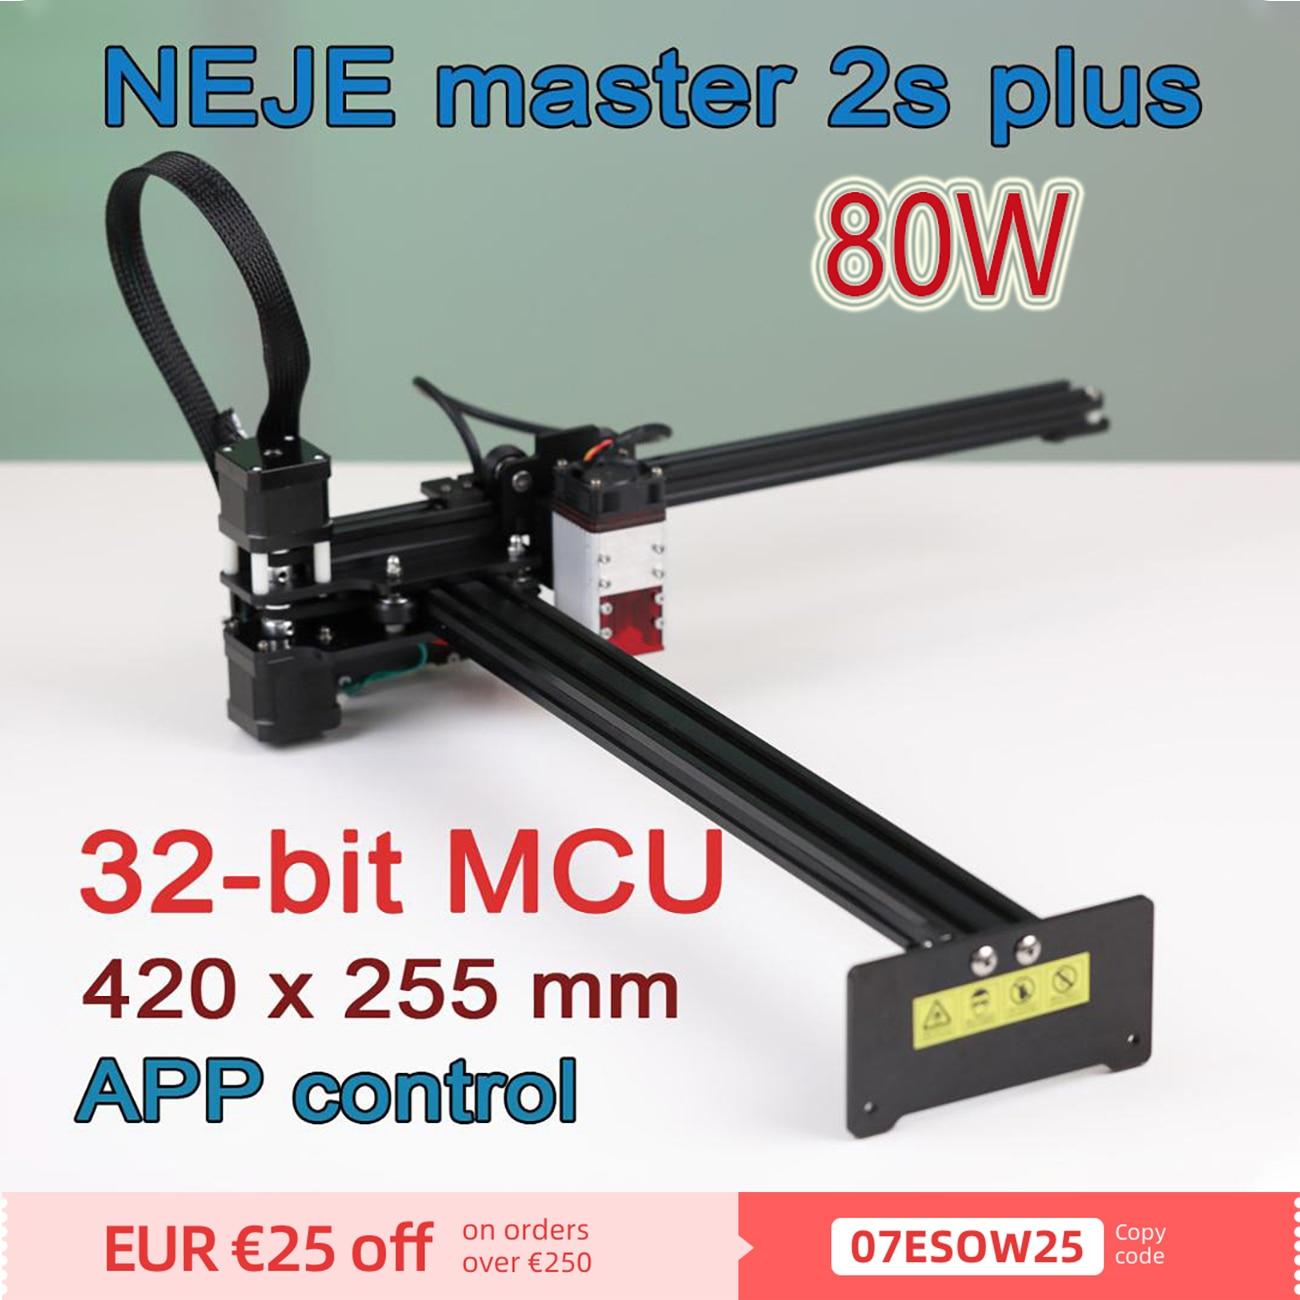 NEJE Master 2S Plus 255x420 مم ماكينة حفر بالليزر صغيرة تعمل بالتحكم العددي بواسطة الحاسوب ، جهاز توجيه الخشب ، نقش ، ماكينة تقطيع